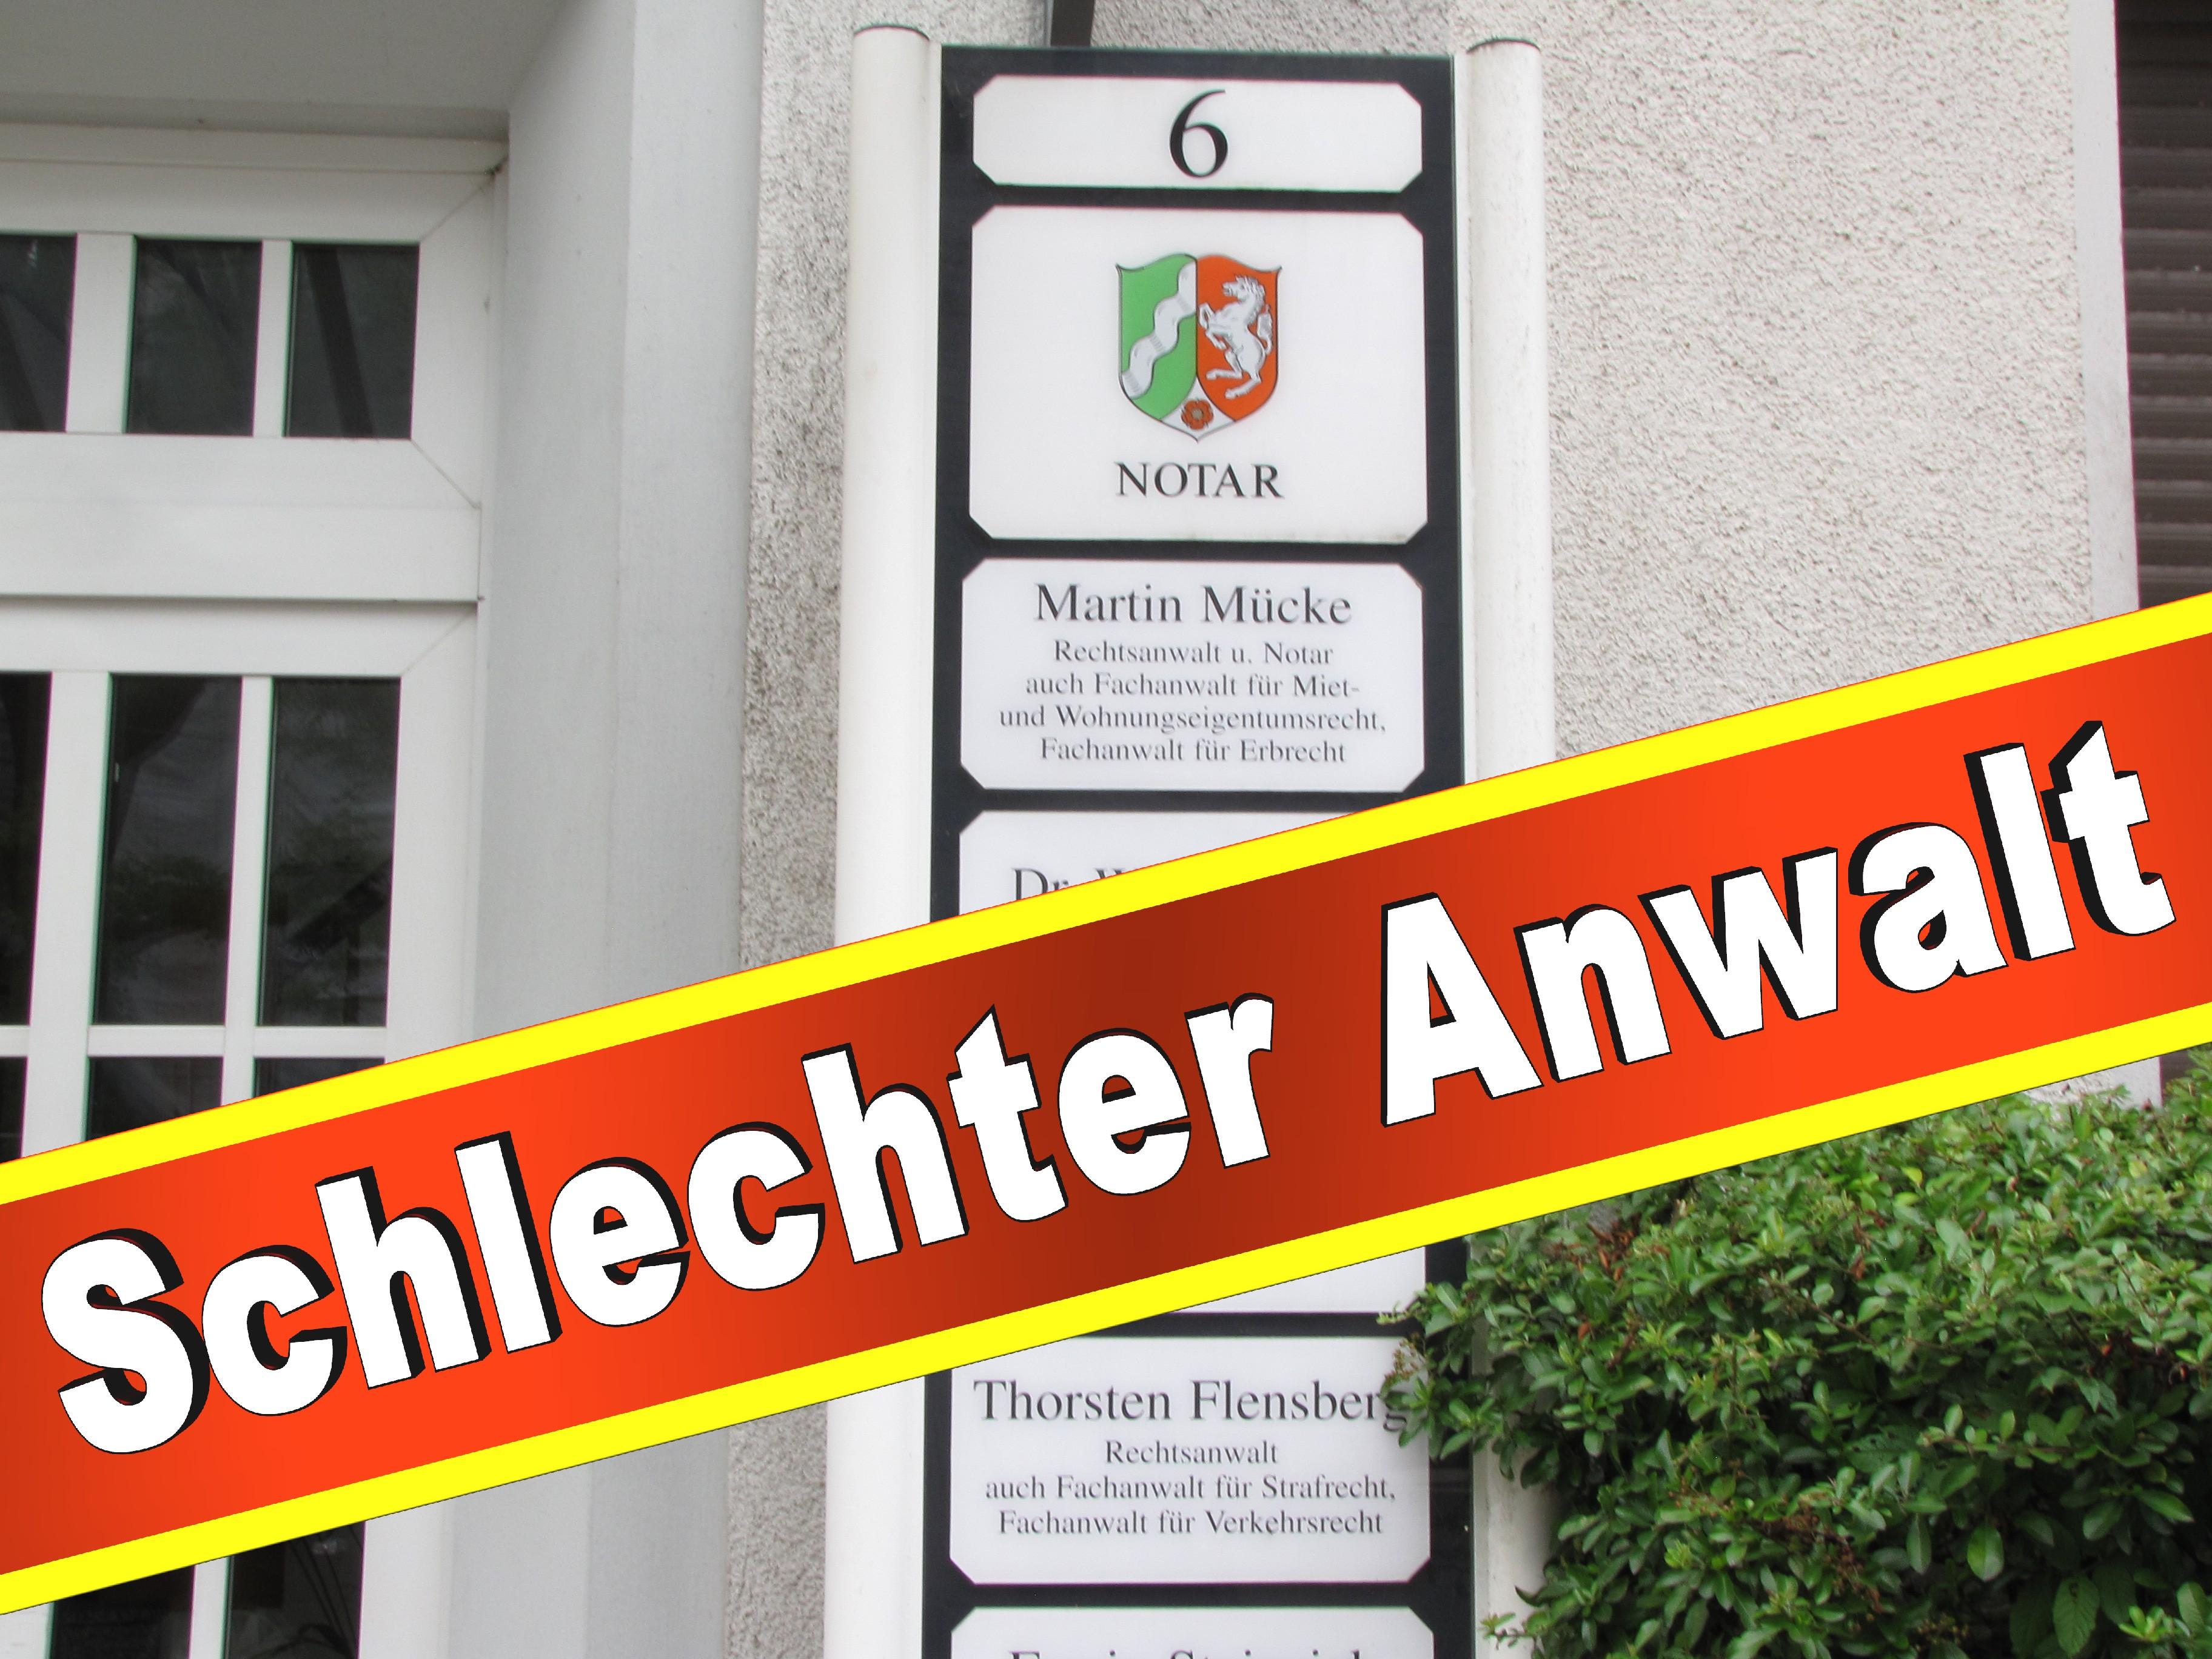 Rechtsanwalt Martin Mücke Bielefeld Maug Und Mücke Kanzlei Rechtsanwaltskanzlei Dr.Maug Martin Mücke Beate Volkmann Thorsten Flensberg Bert Upmann Erwin Steinsiek